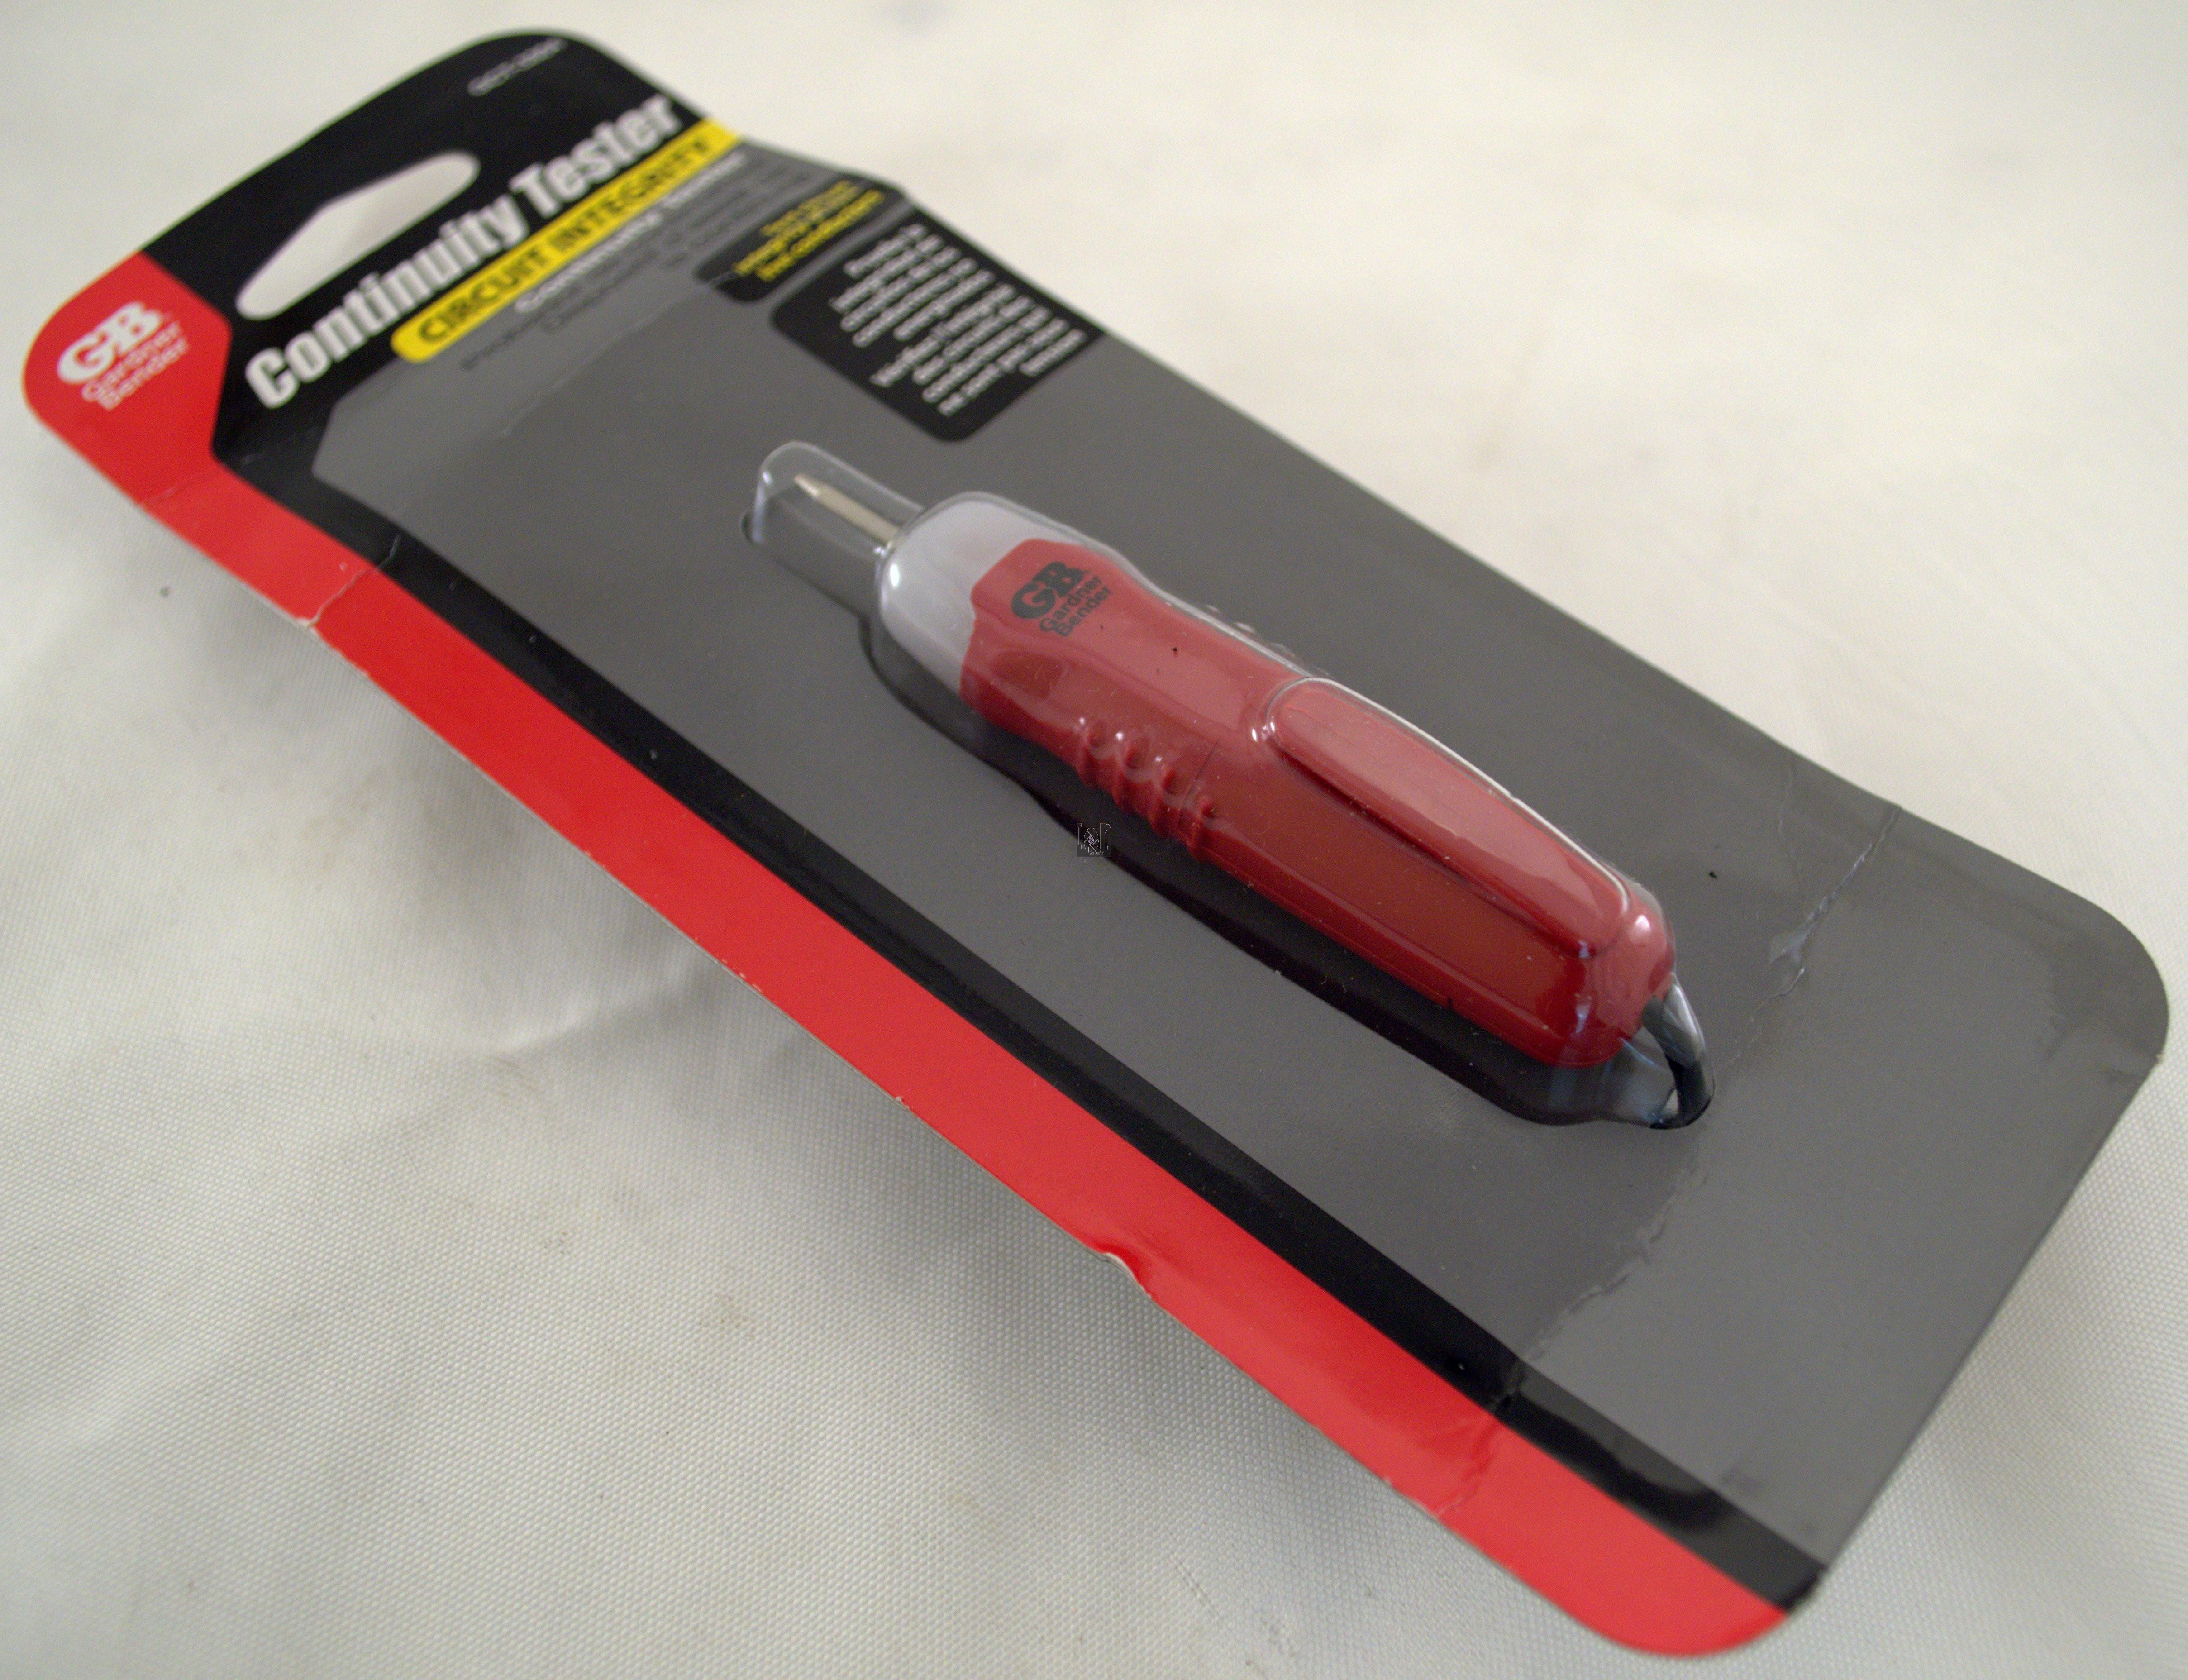 Gardner Bender GCT-3304 Continuity Tester Electrical Tools